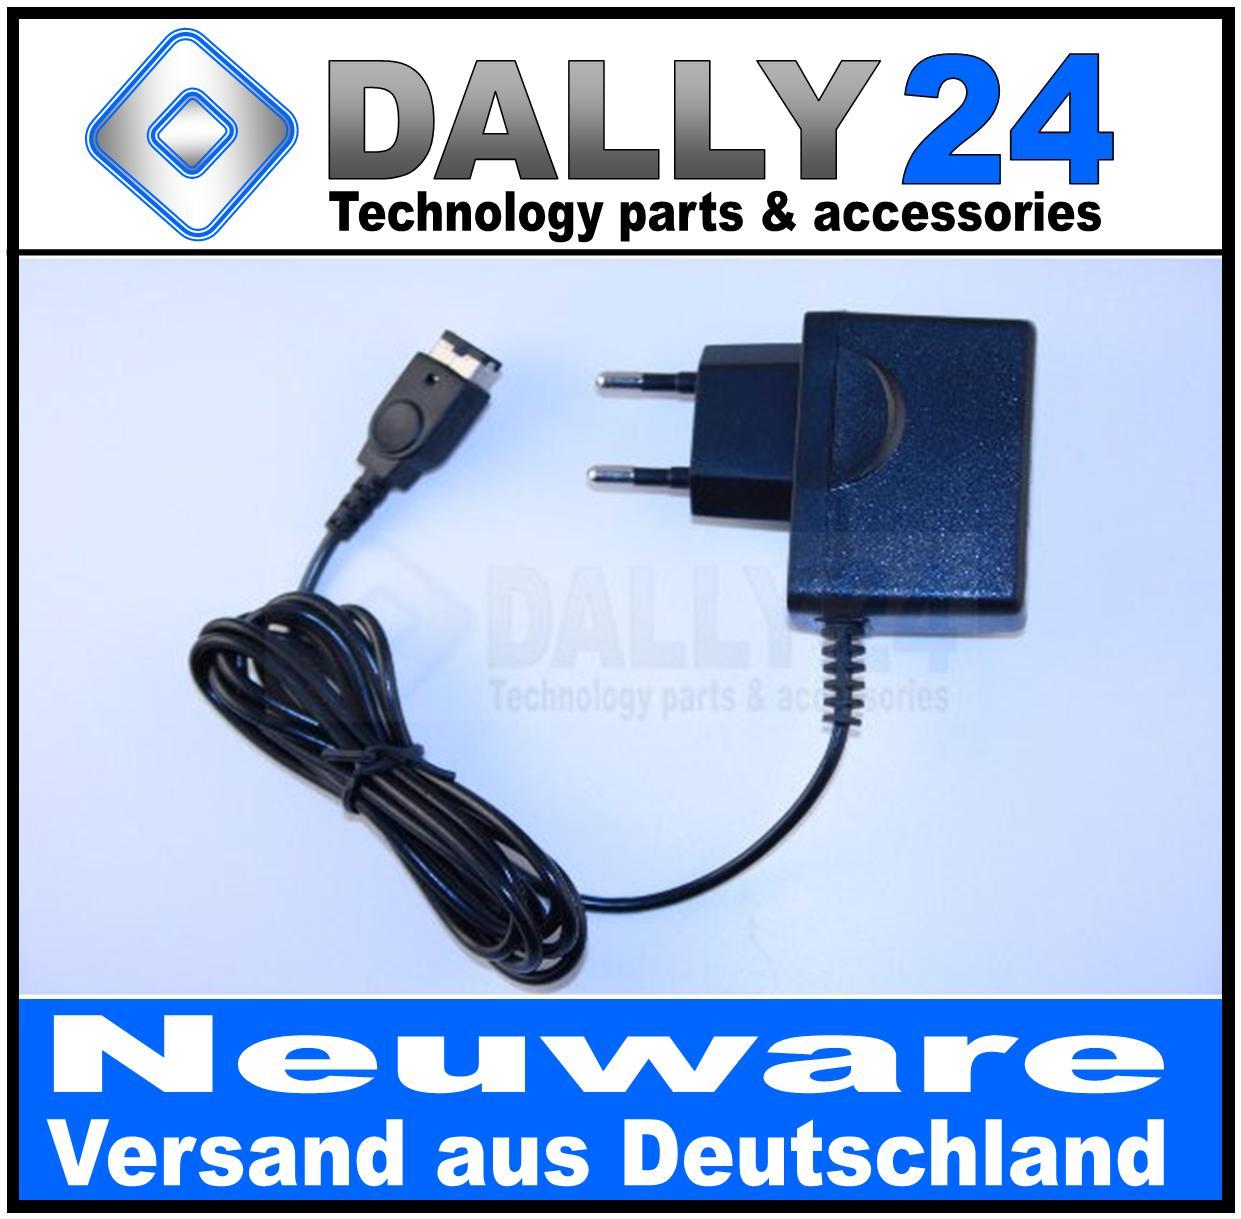 Netzteil-fuer-Gameboy-Advance-SP-Nintendo-DS-Ladegeraet